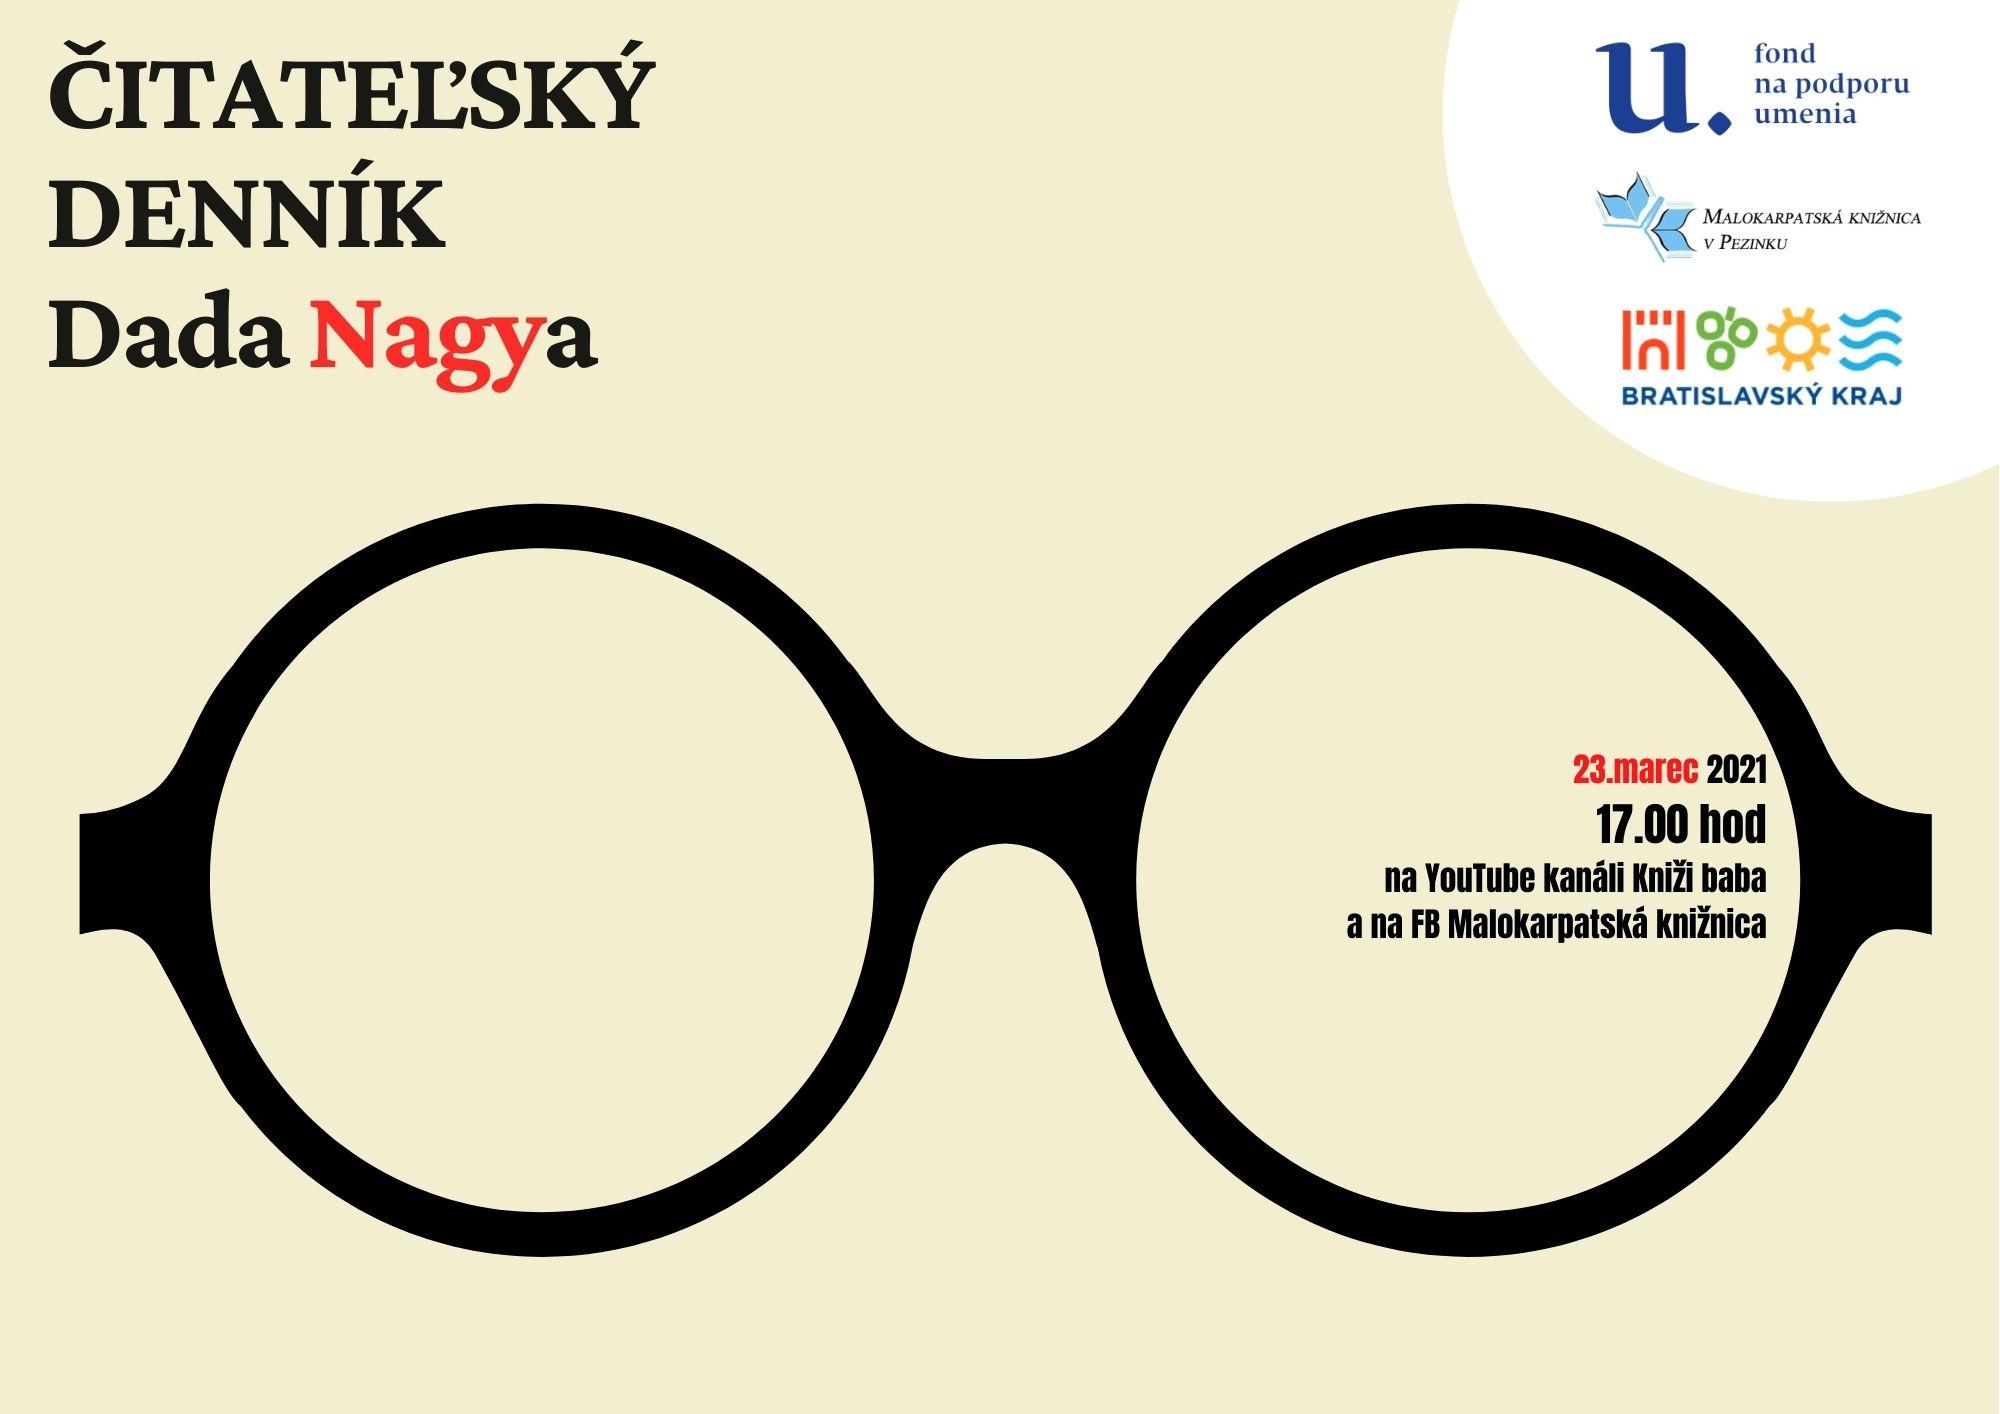 Čitateľský denník Dada Nagya